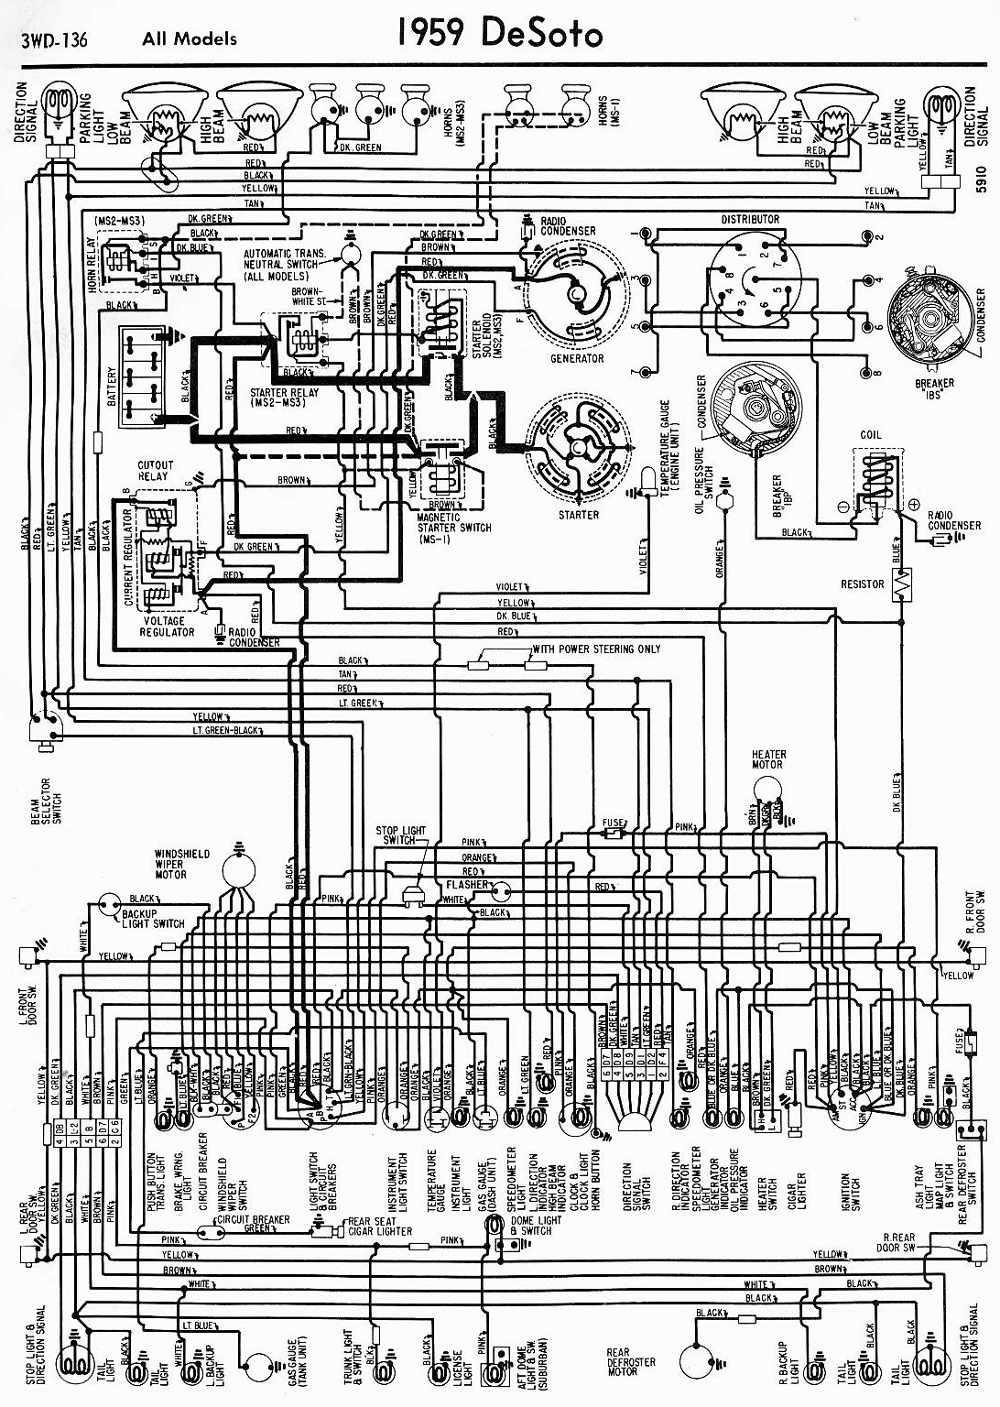 medium resolution of 1949 desoto wiring diagrams wiring diagrams wiring diagrams of 1959 desoto all models t 1508403749 1949 desoto wiring diagrams